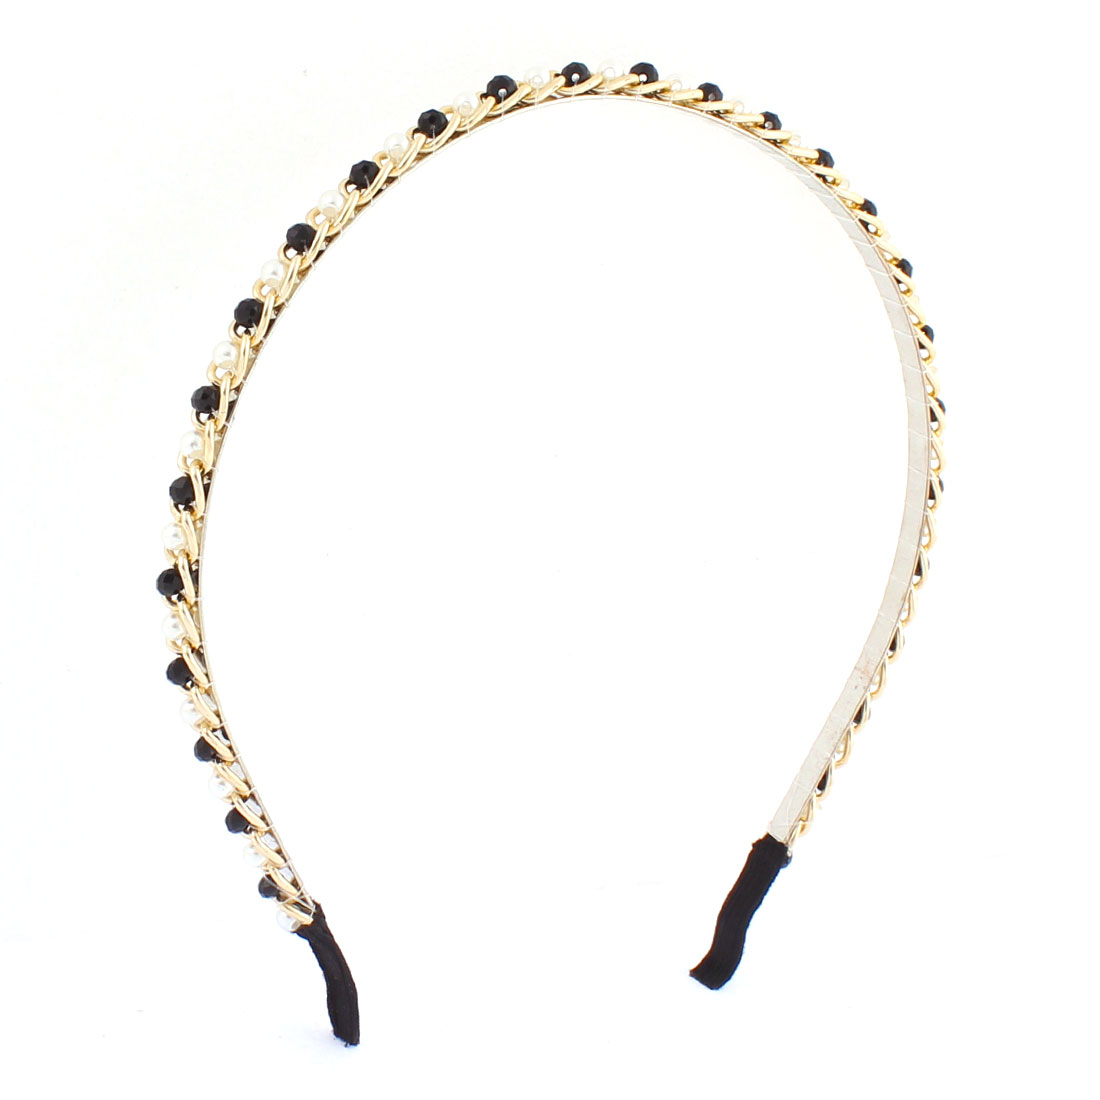 Lady Faux Beads Rhinestone Inlaid Metal Chain Decor Hair Hoop Hairband Headband Hairpin Headdressing